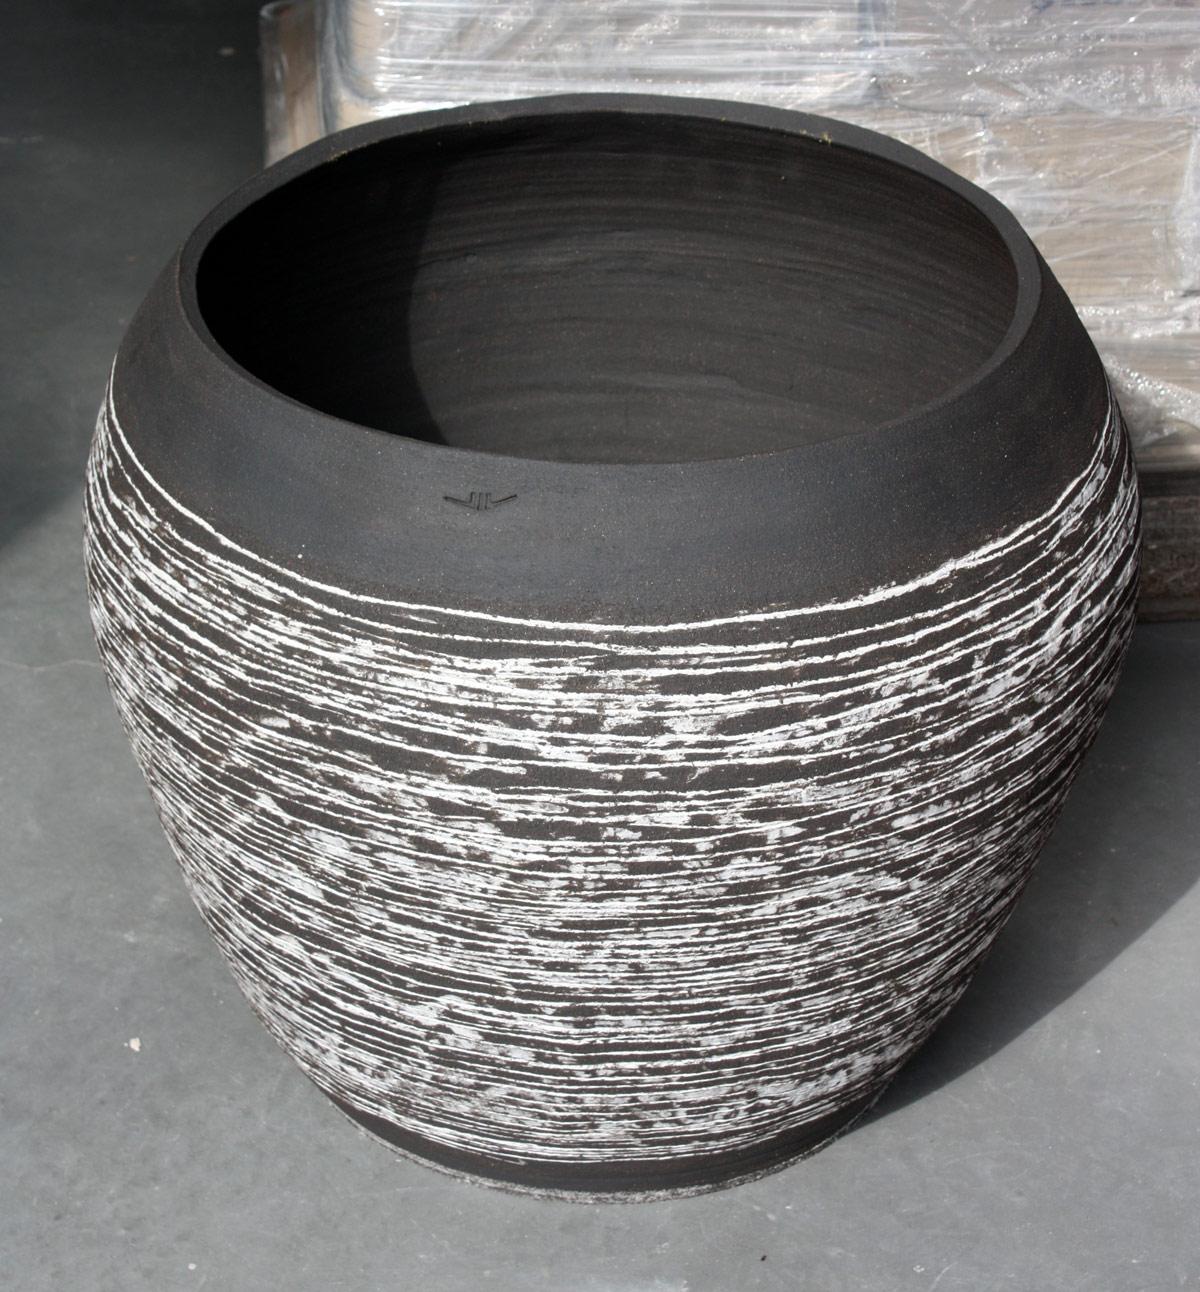 viviane-franki-grote-potten-2l